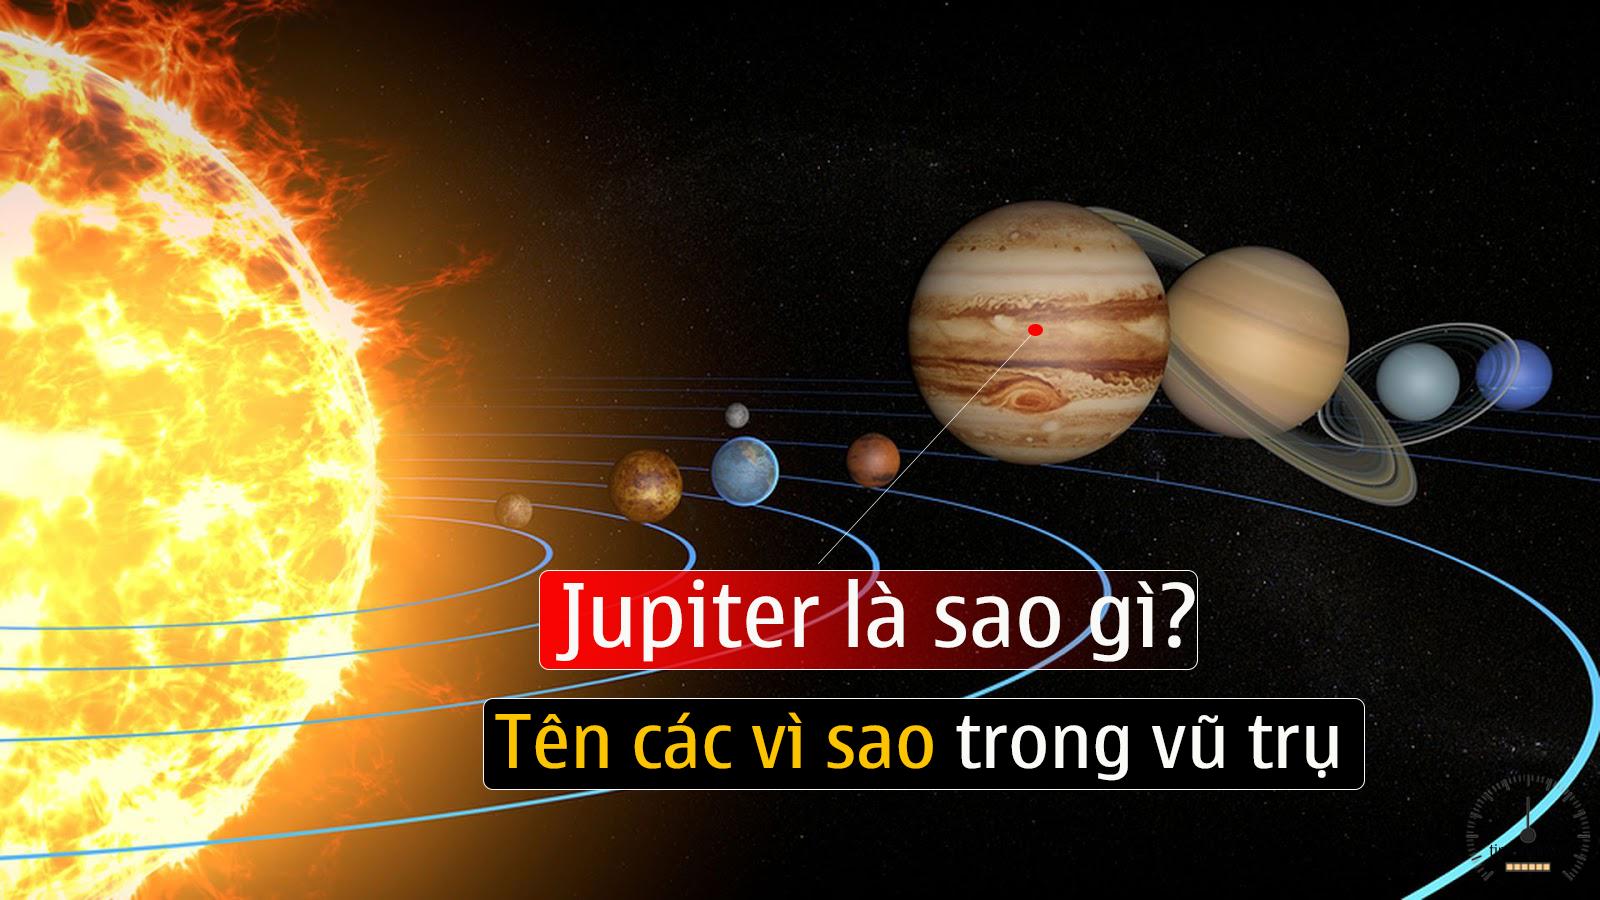 jupiter-la-sao-gi-ten-cac-sao-trong-he-mat-troi